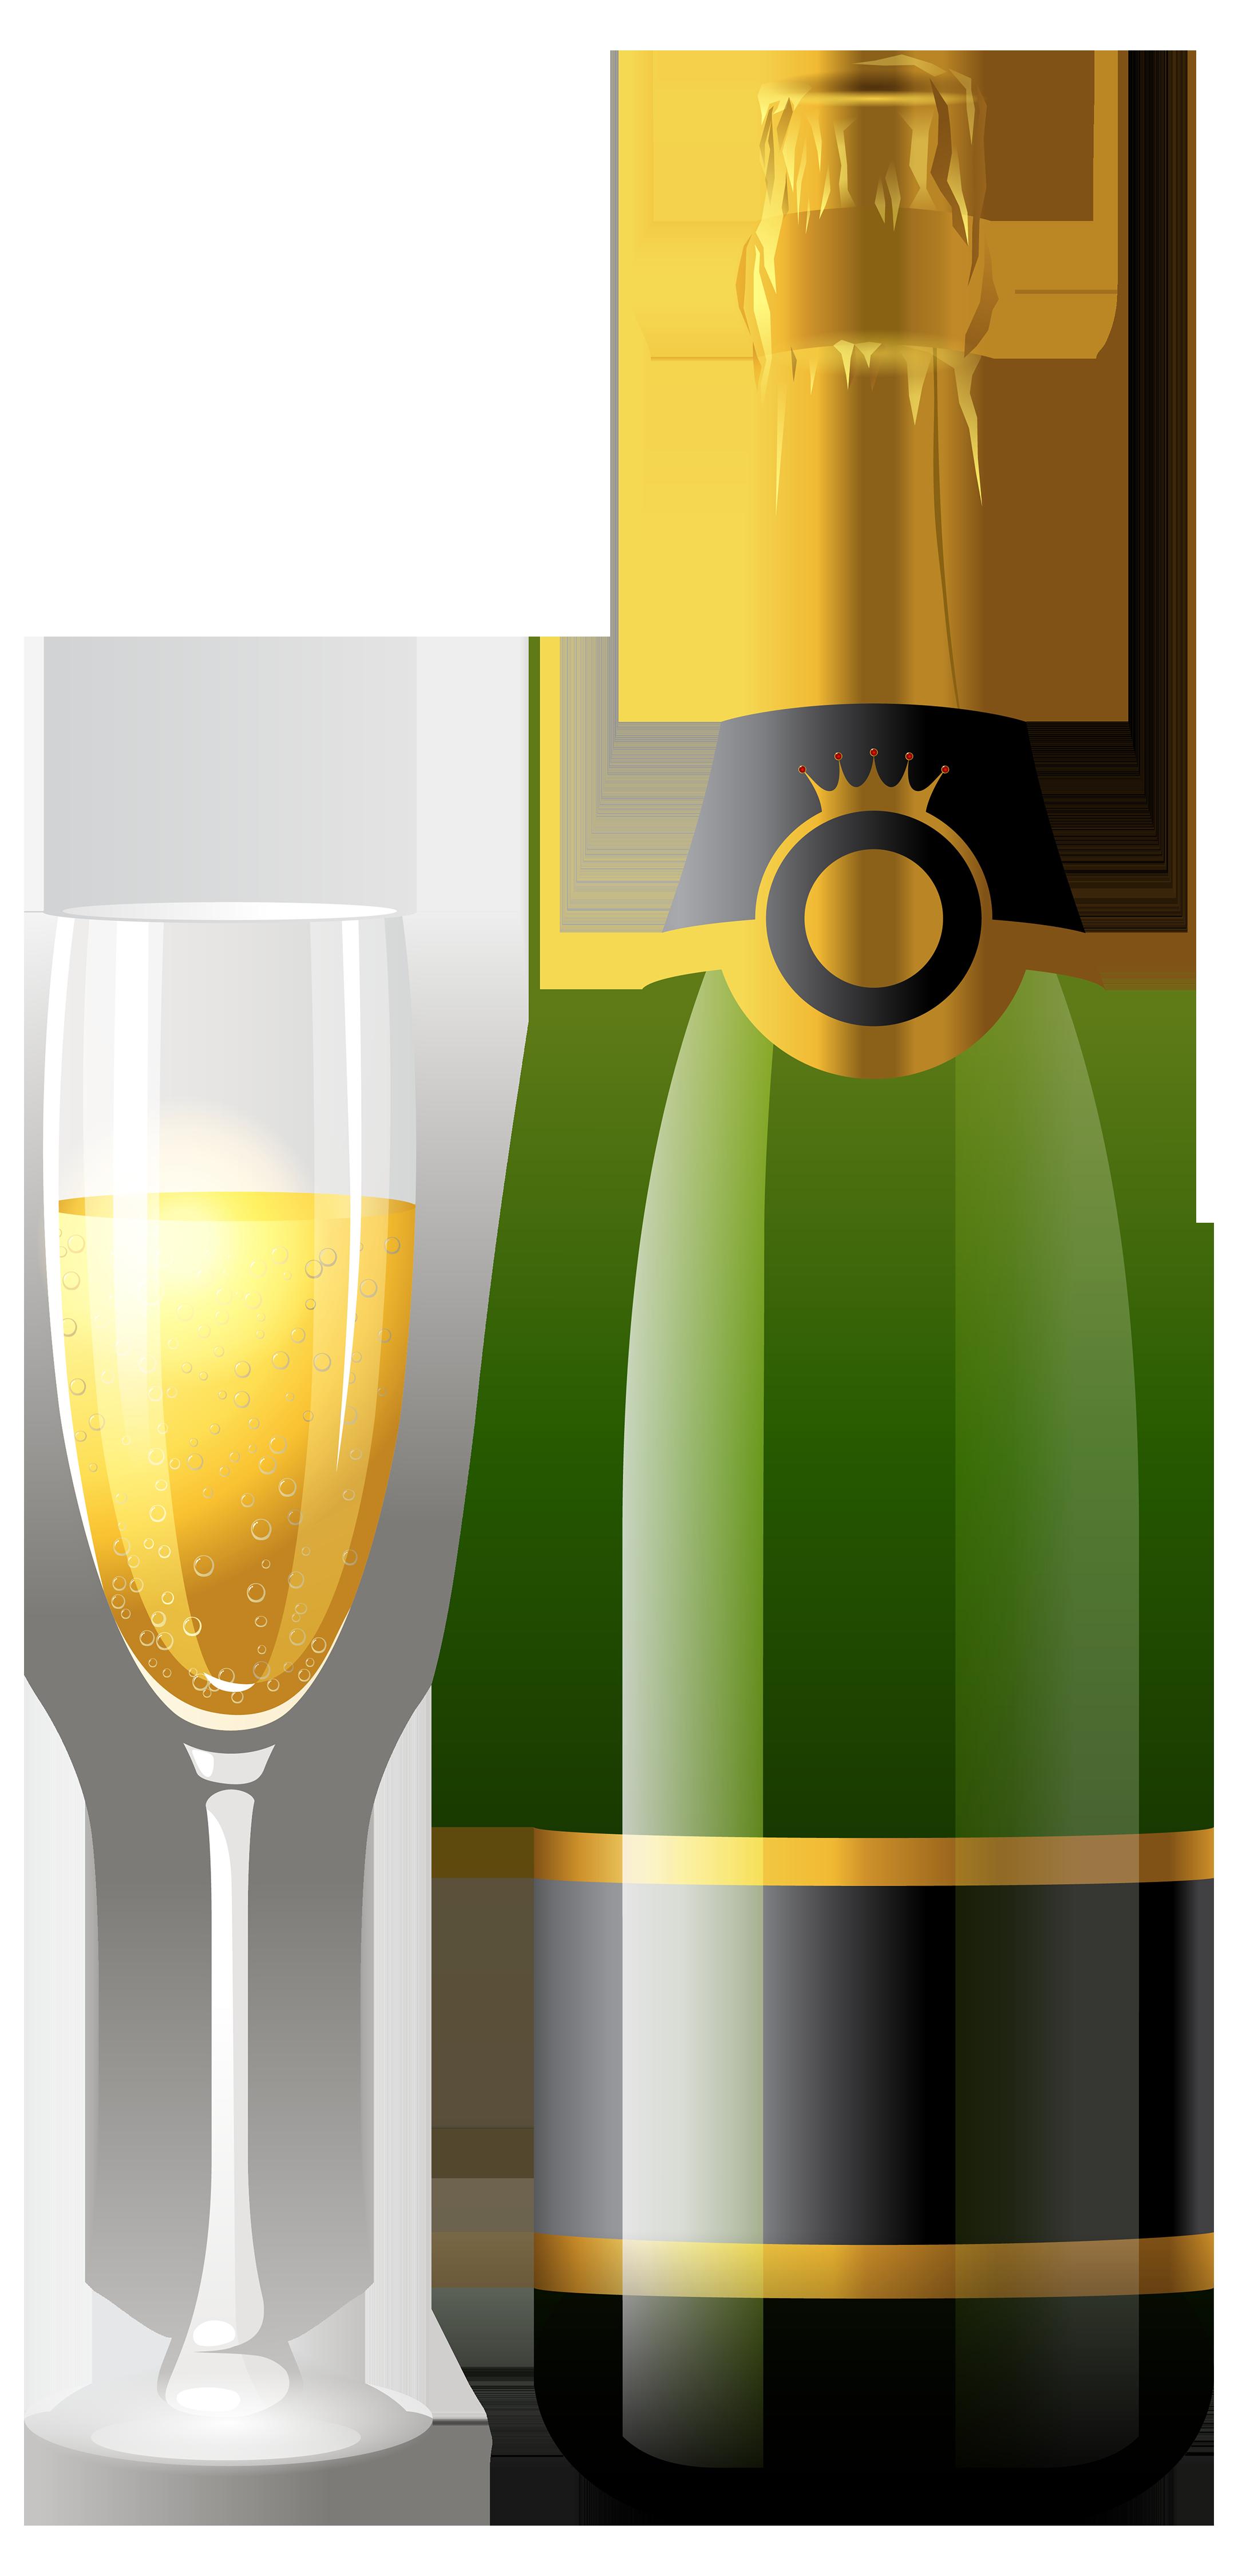 Clipart halloween wine. Champagne bottle glasses szukaj